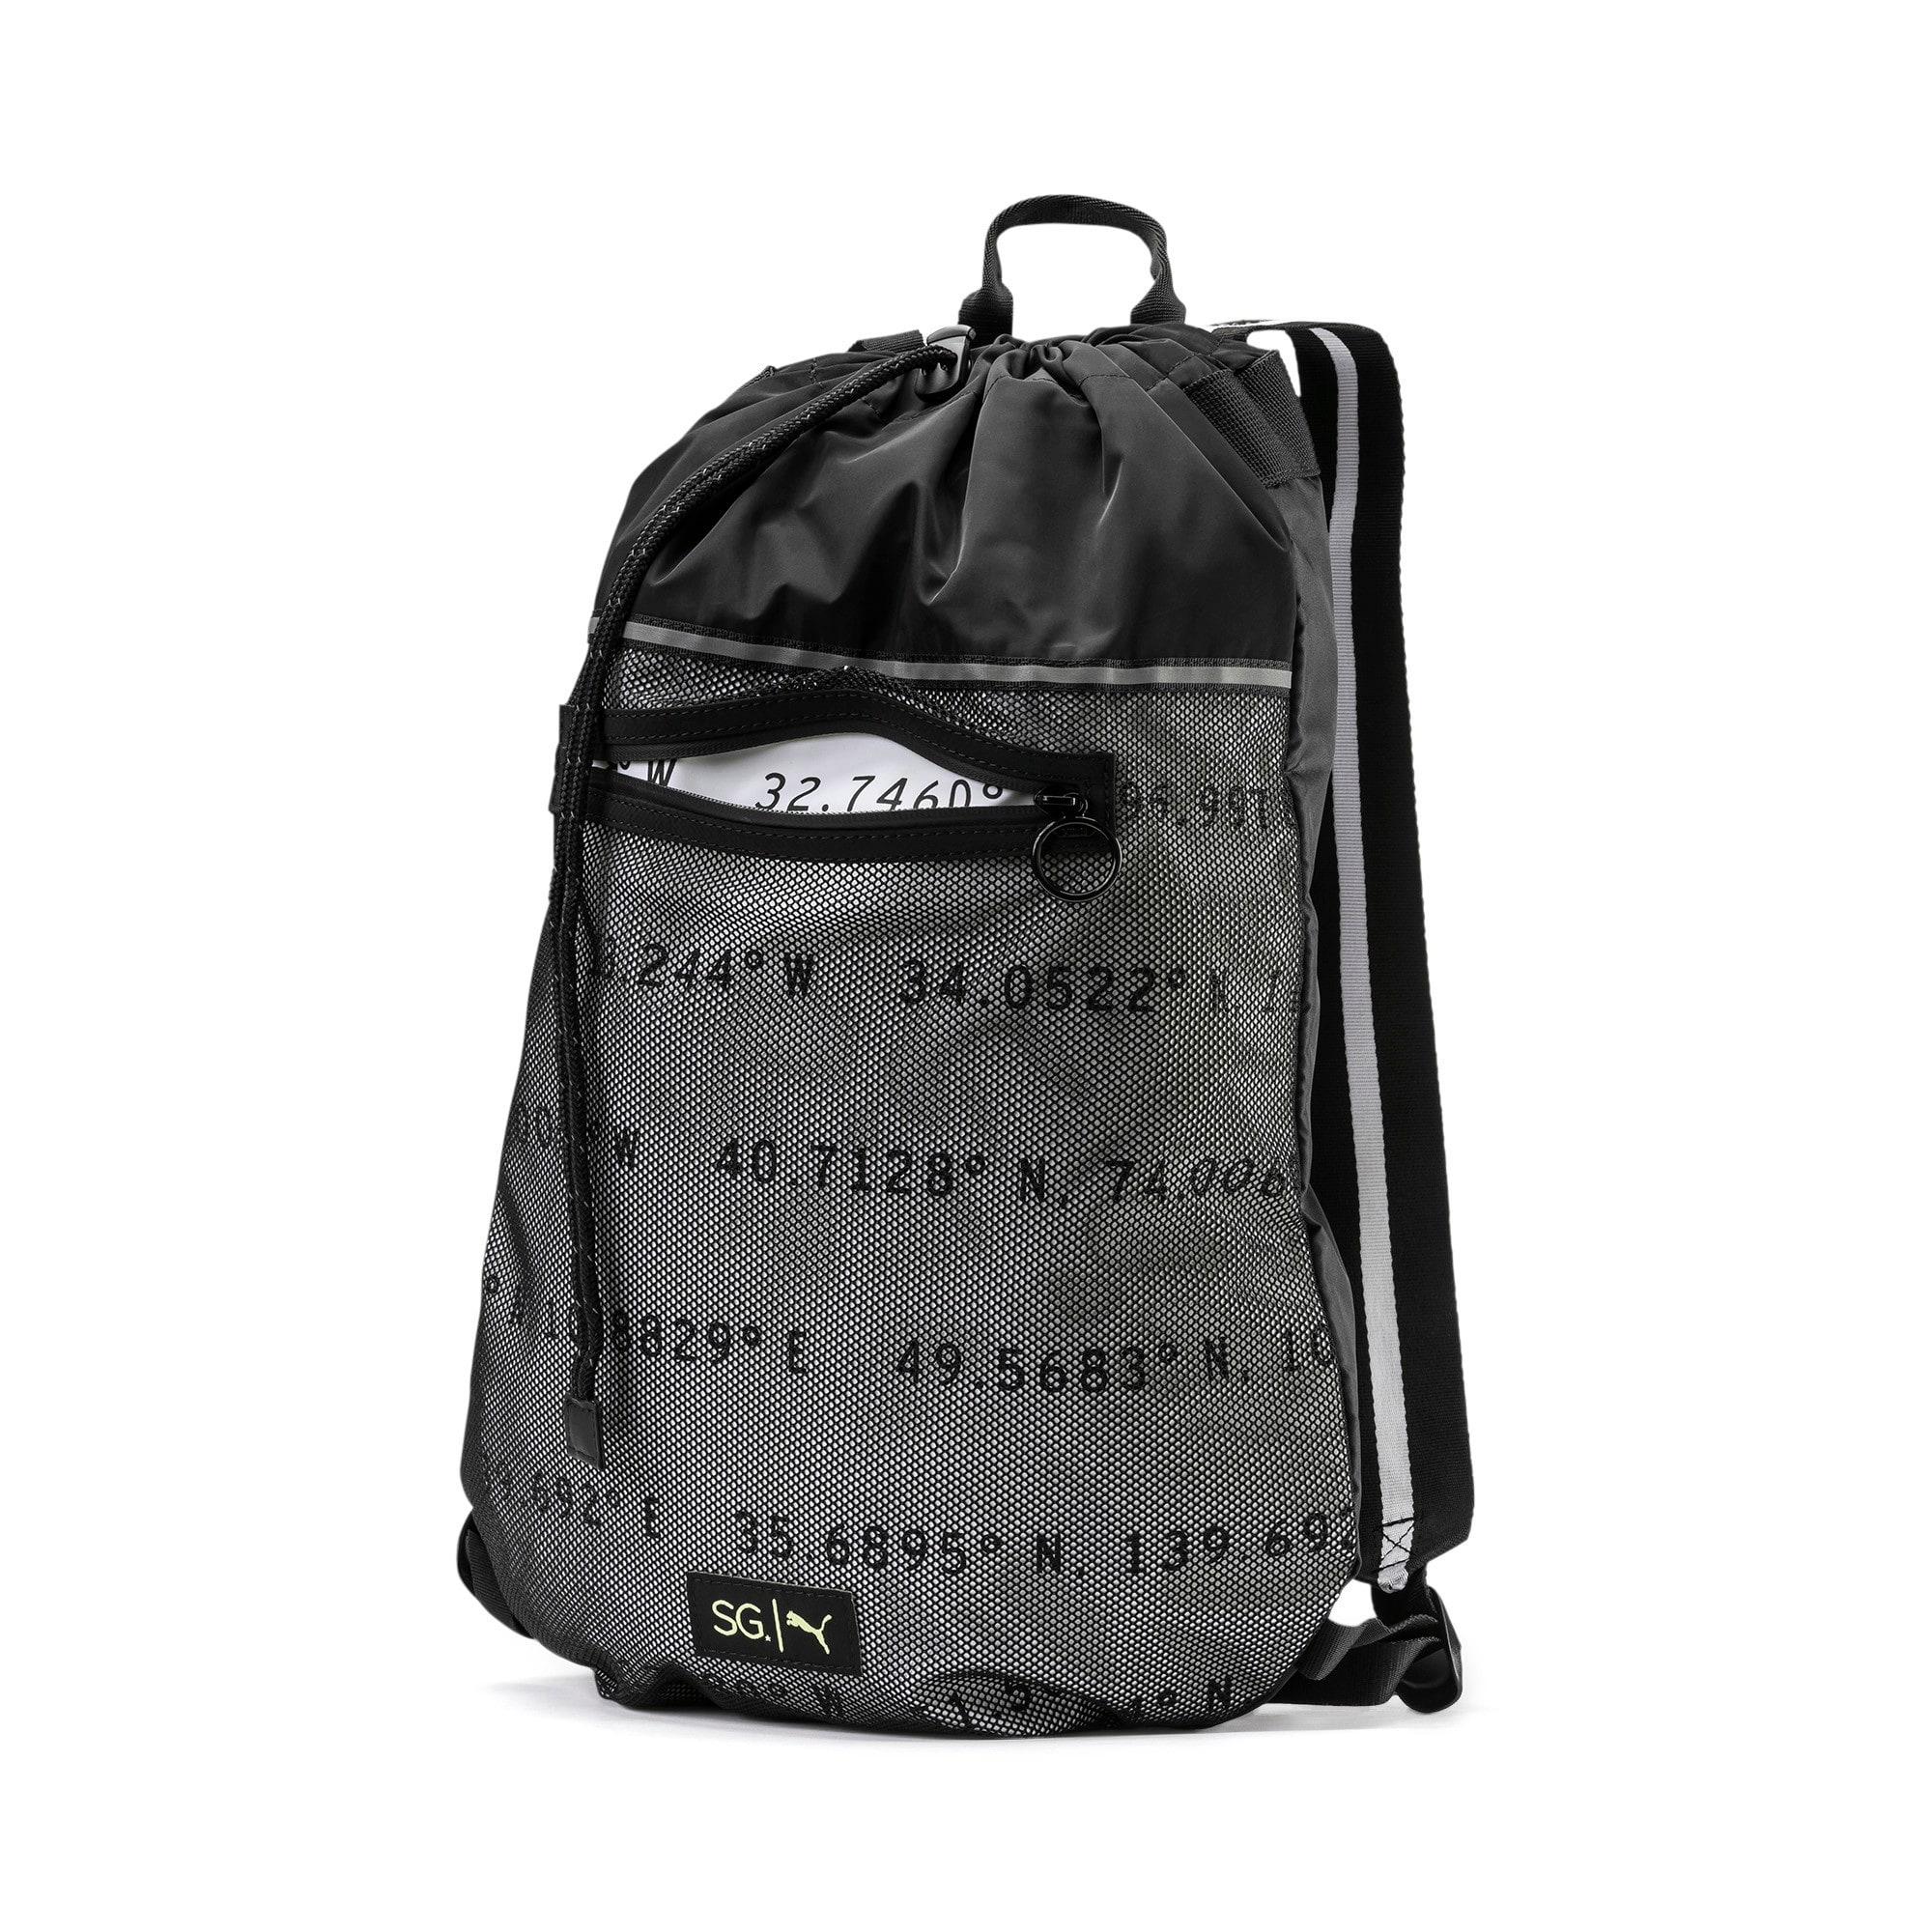 Thumbnail 4 of SG x PUMA Sport Smart Bag, Puma Black, medium